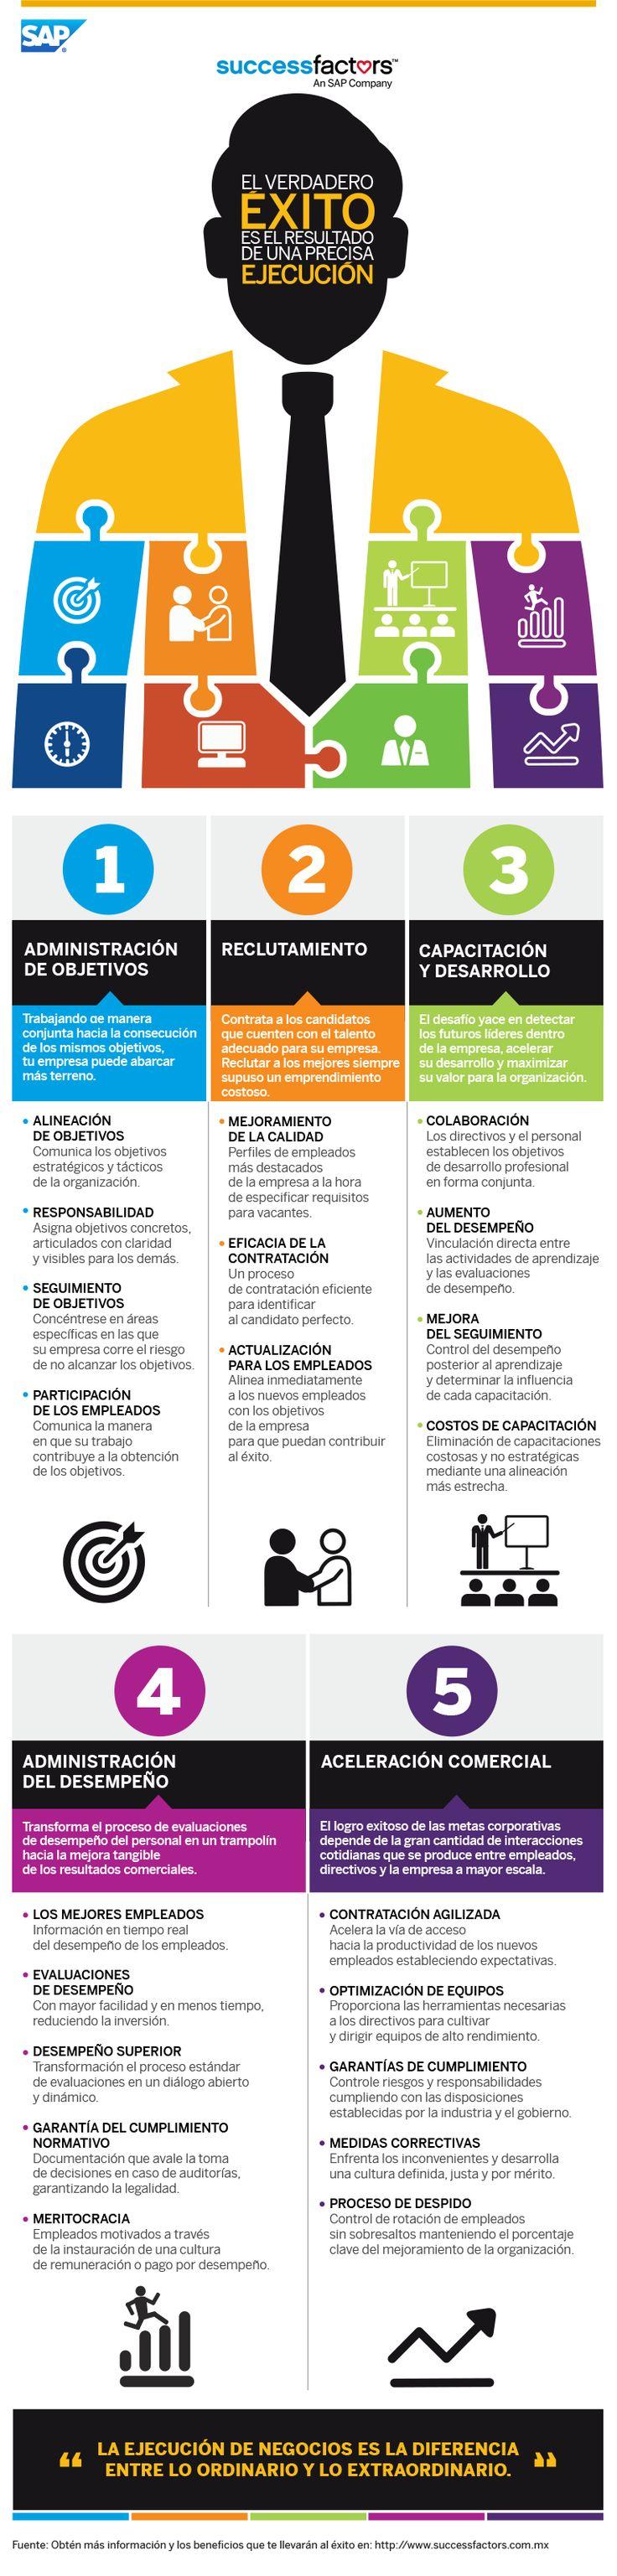 Recursos humanos: mejores decisiones para cambios reales. #infografia